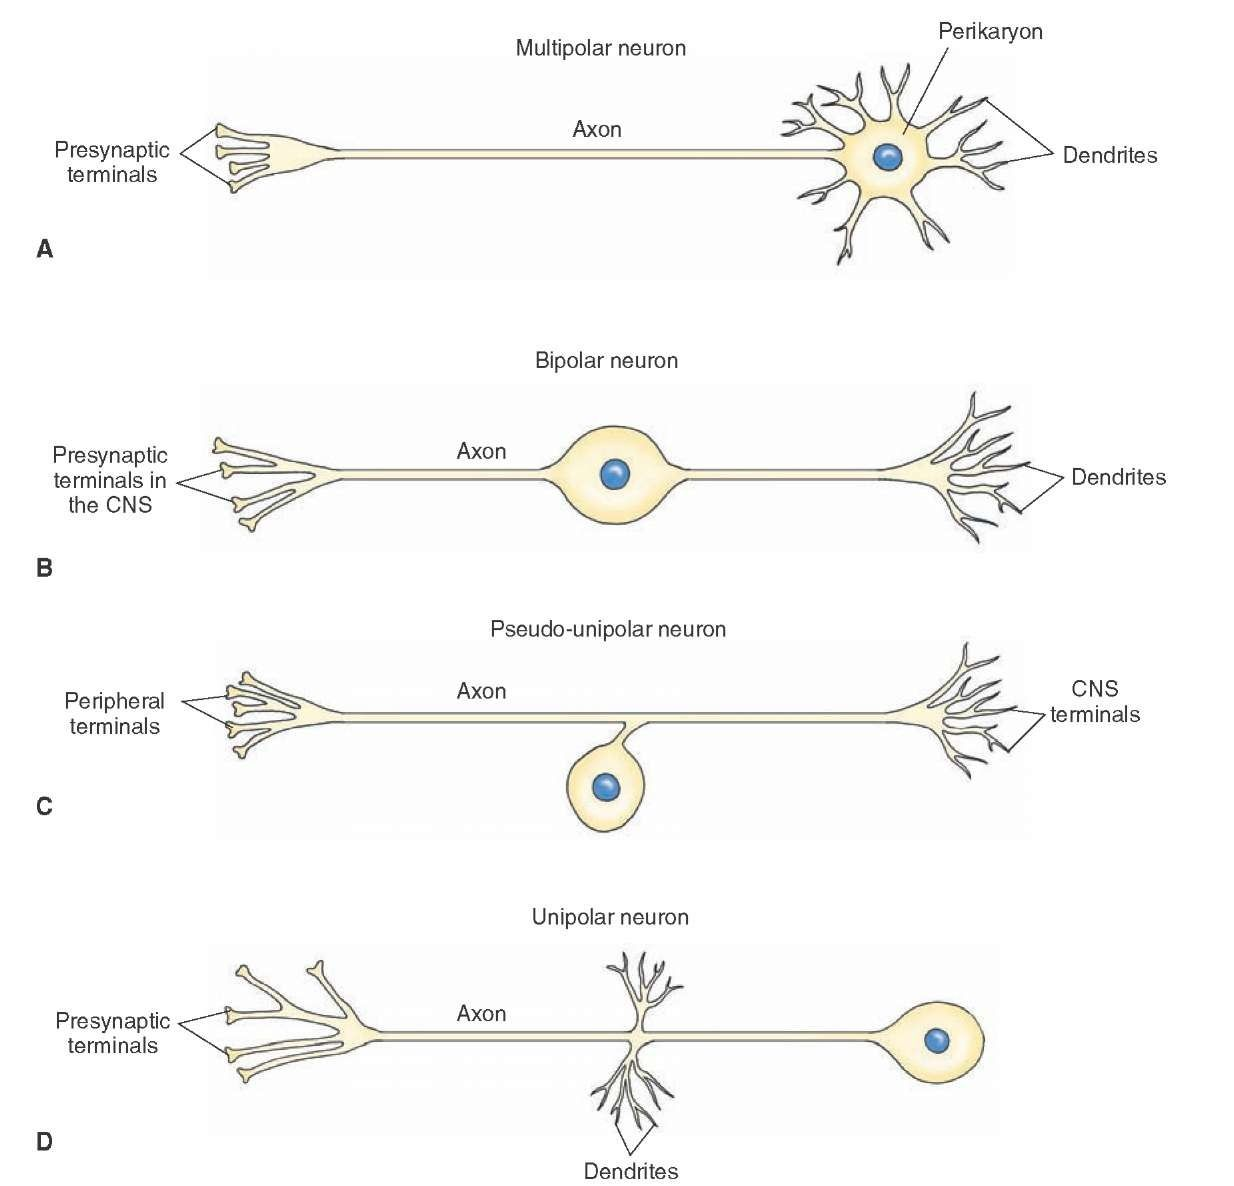 medium resolution of different types of neurons a multipolar neuron b bipolar neuron c pseudo unipolar neuron d unipolar neuron cns central nervous system